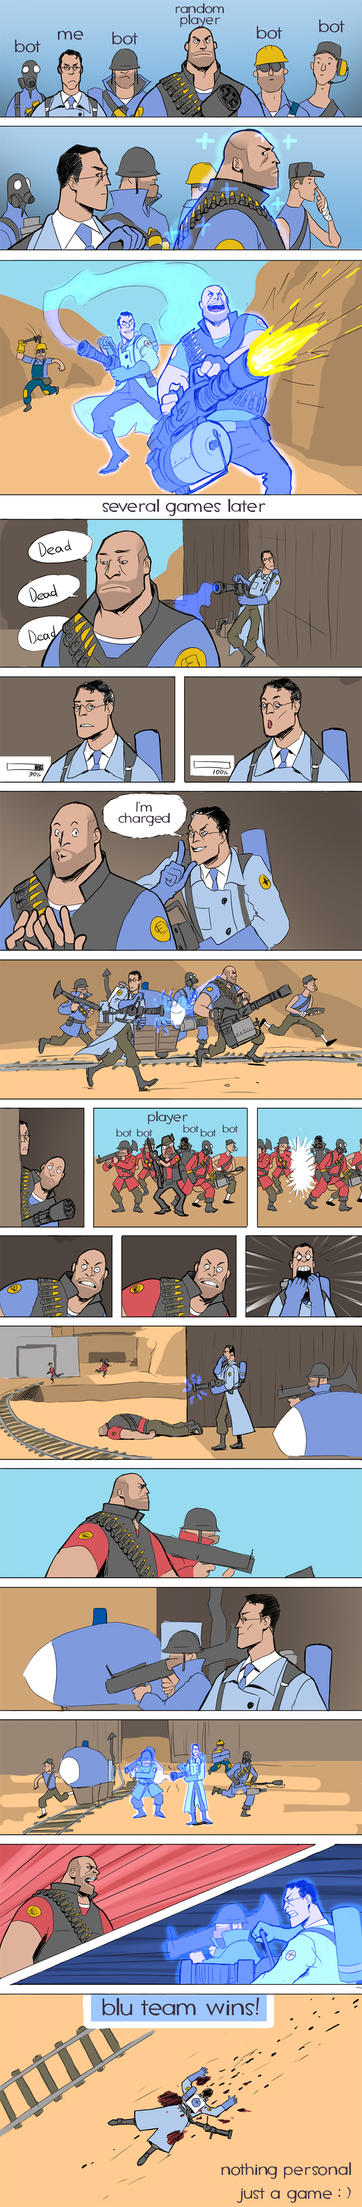 True Story by Arvense